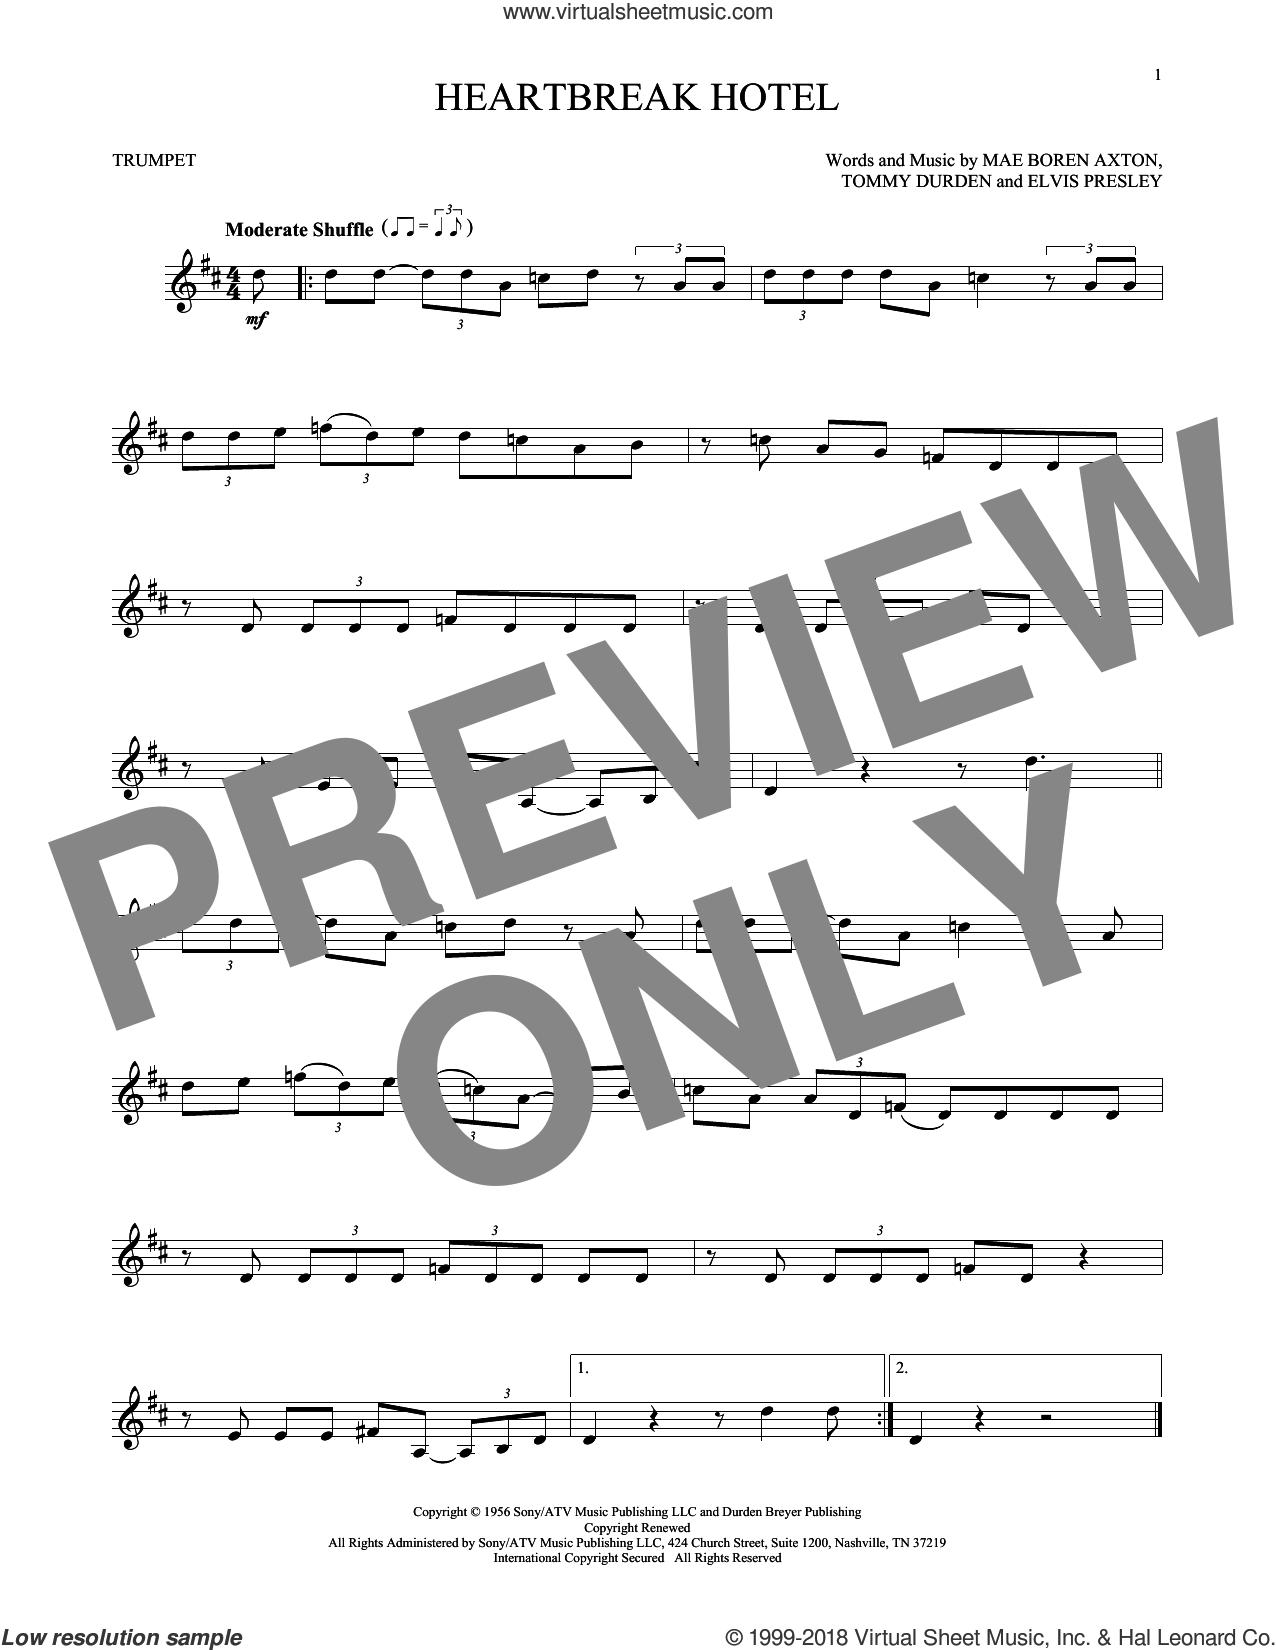 Heartbreak Hotel sheet music for trumpet solo by Elvis Presley, Mae Boren Axton and Tommy Durden, intermediate skill level